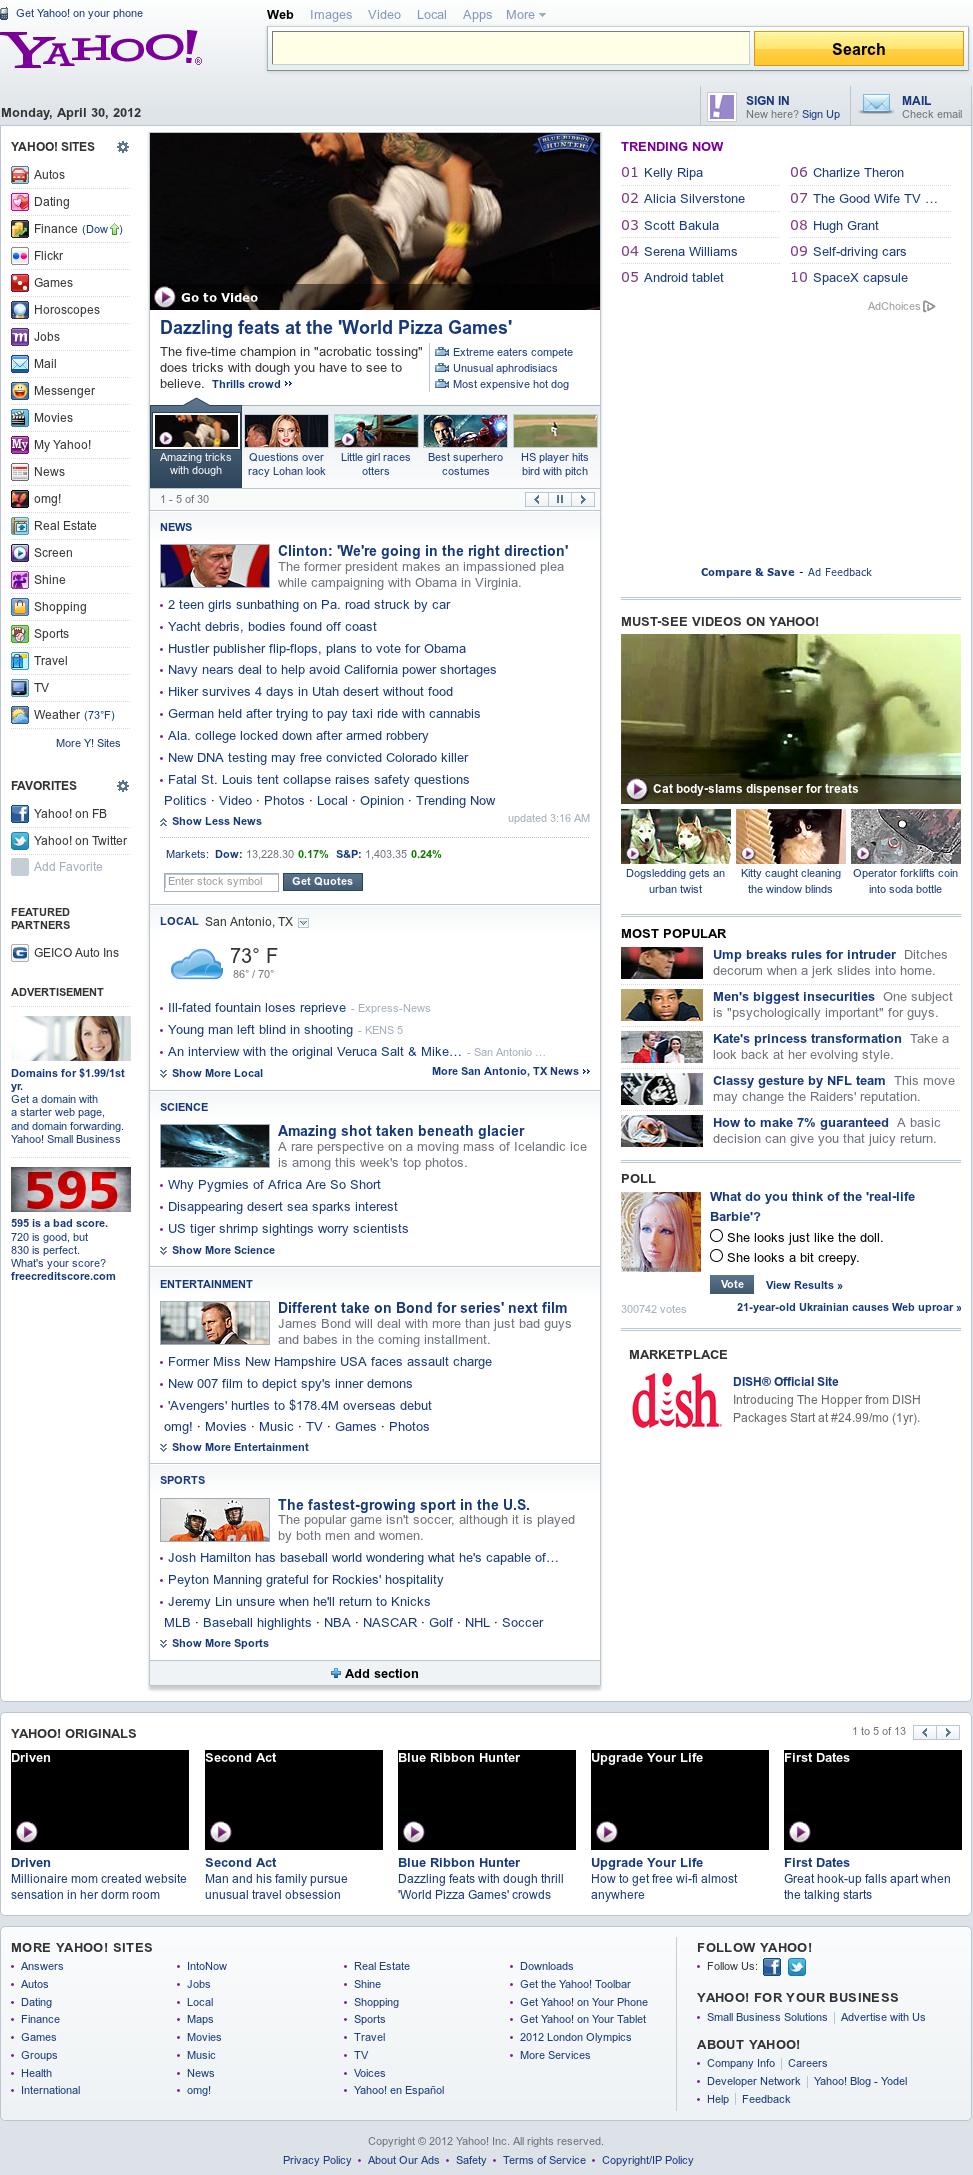 Yahoo! News at Monday April 30, 2012, 7:16 a.m. UTC